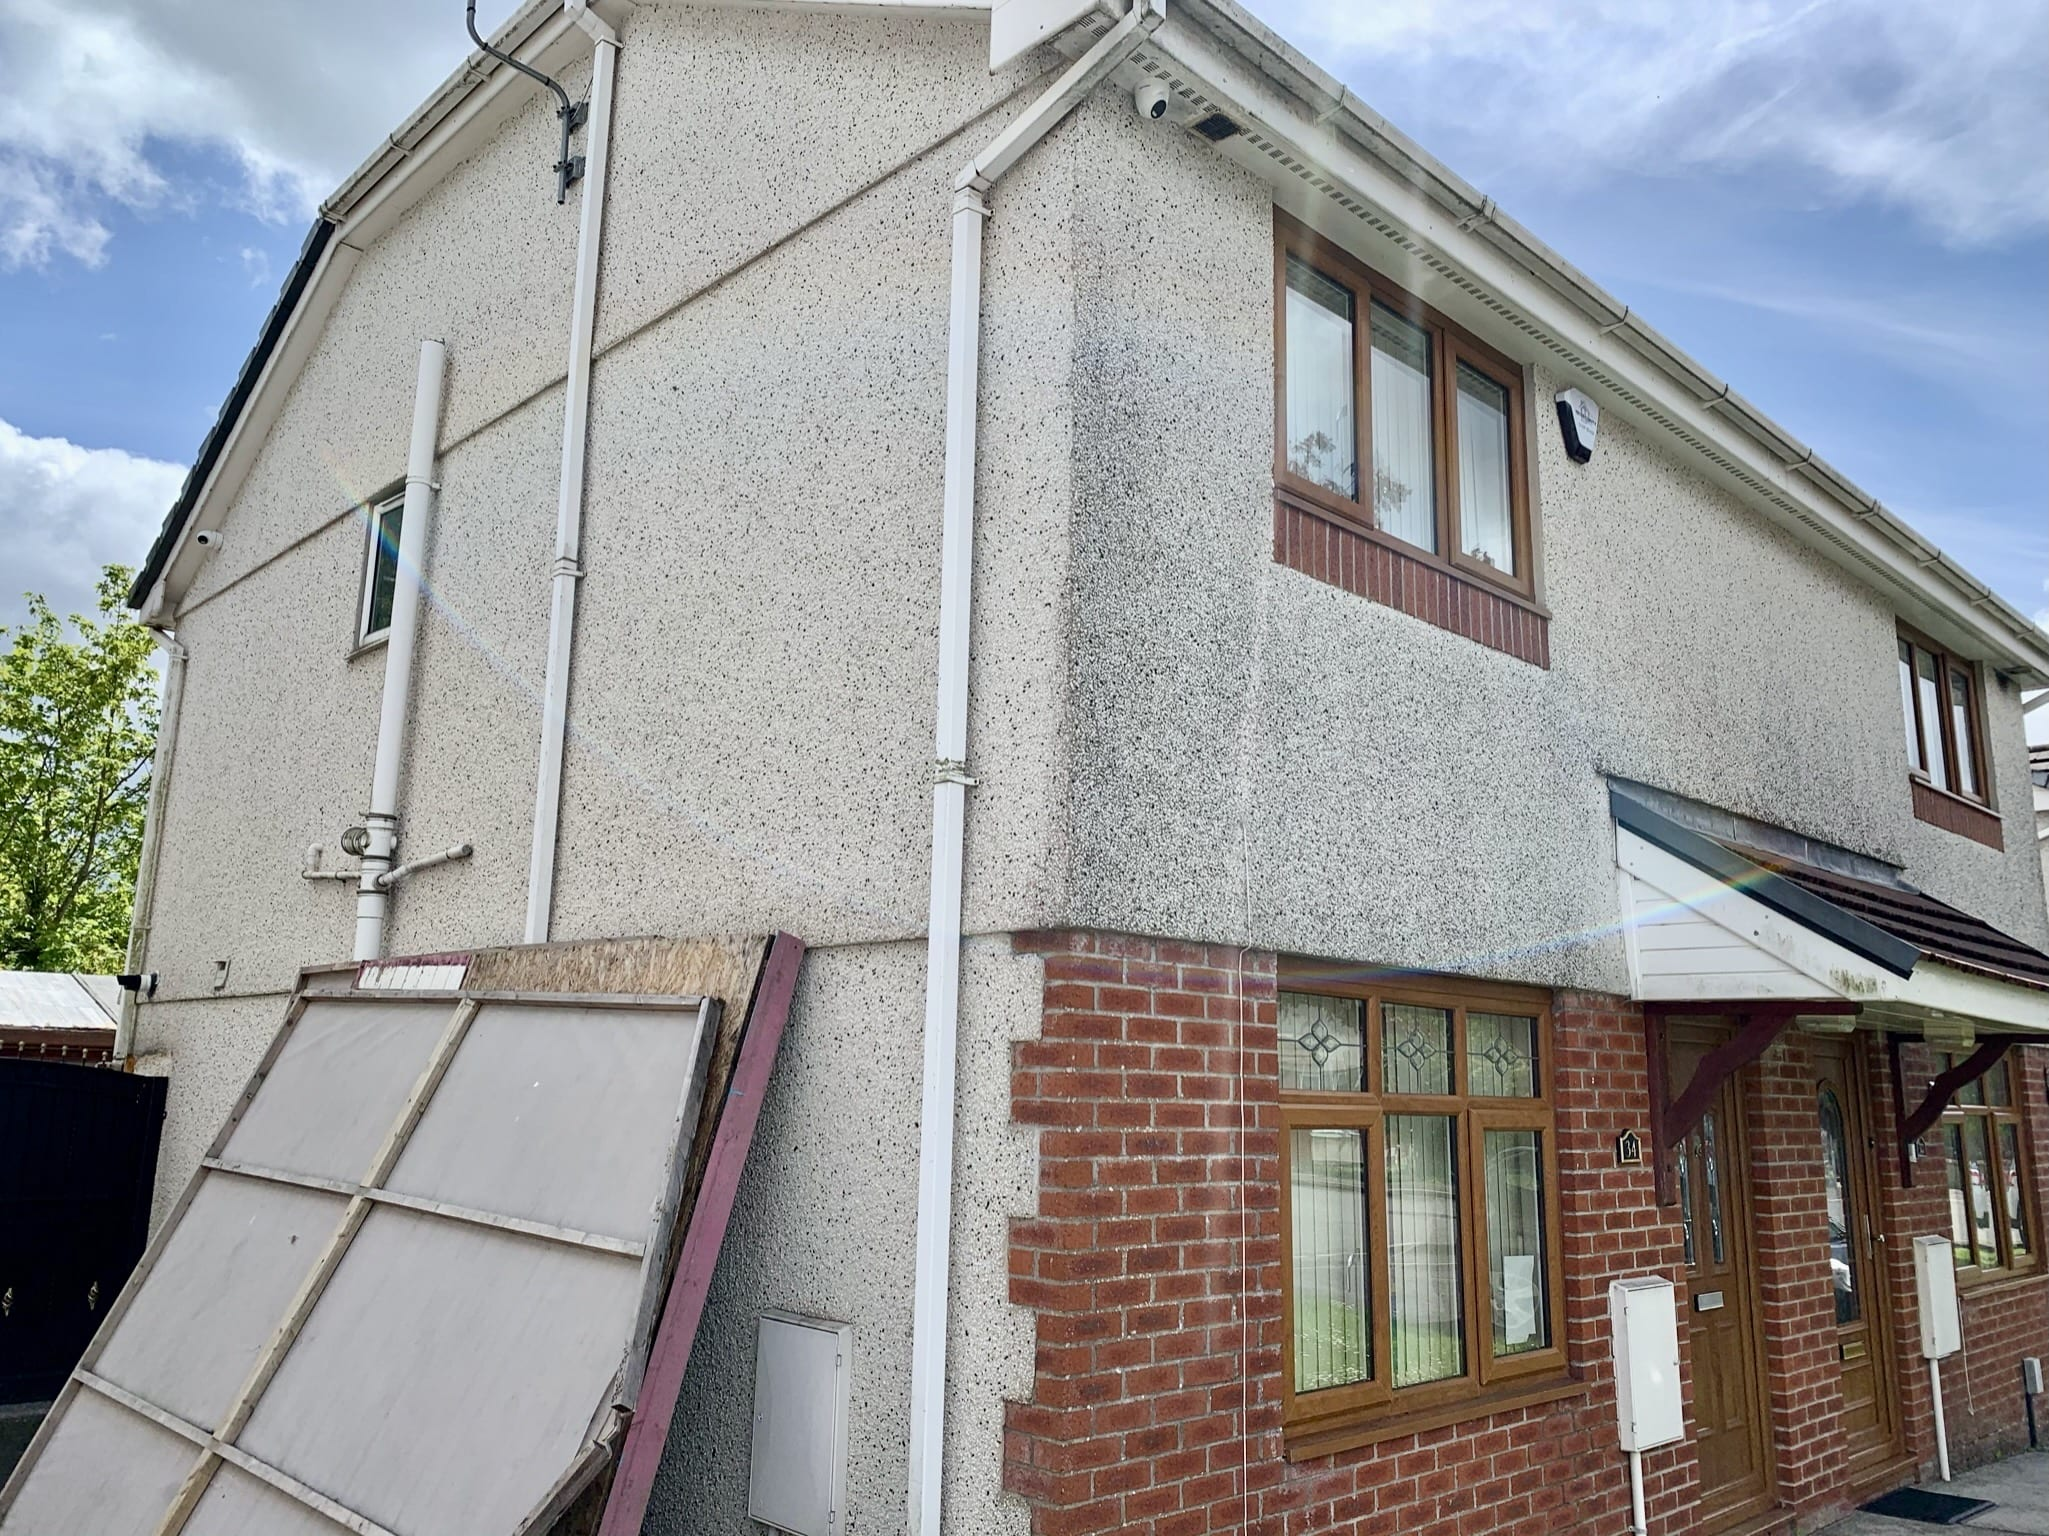 CCTV and alarm on house